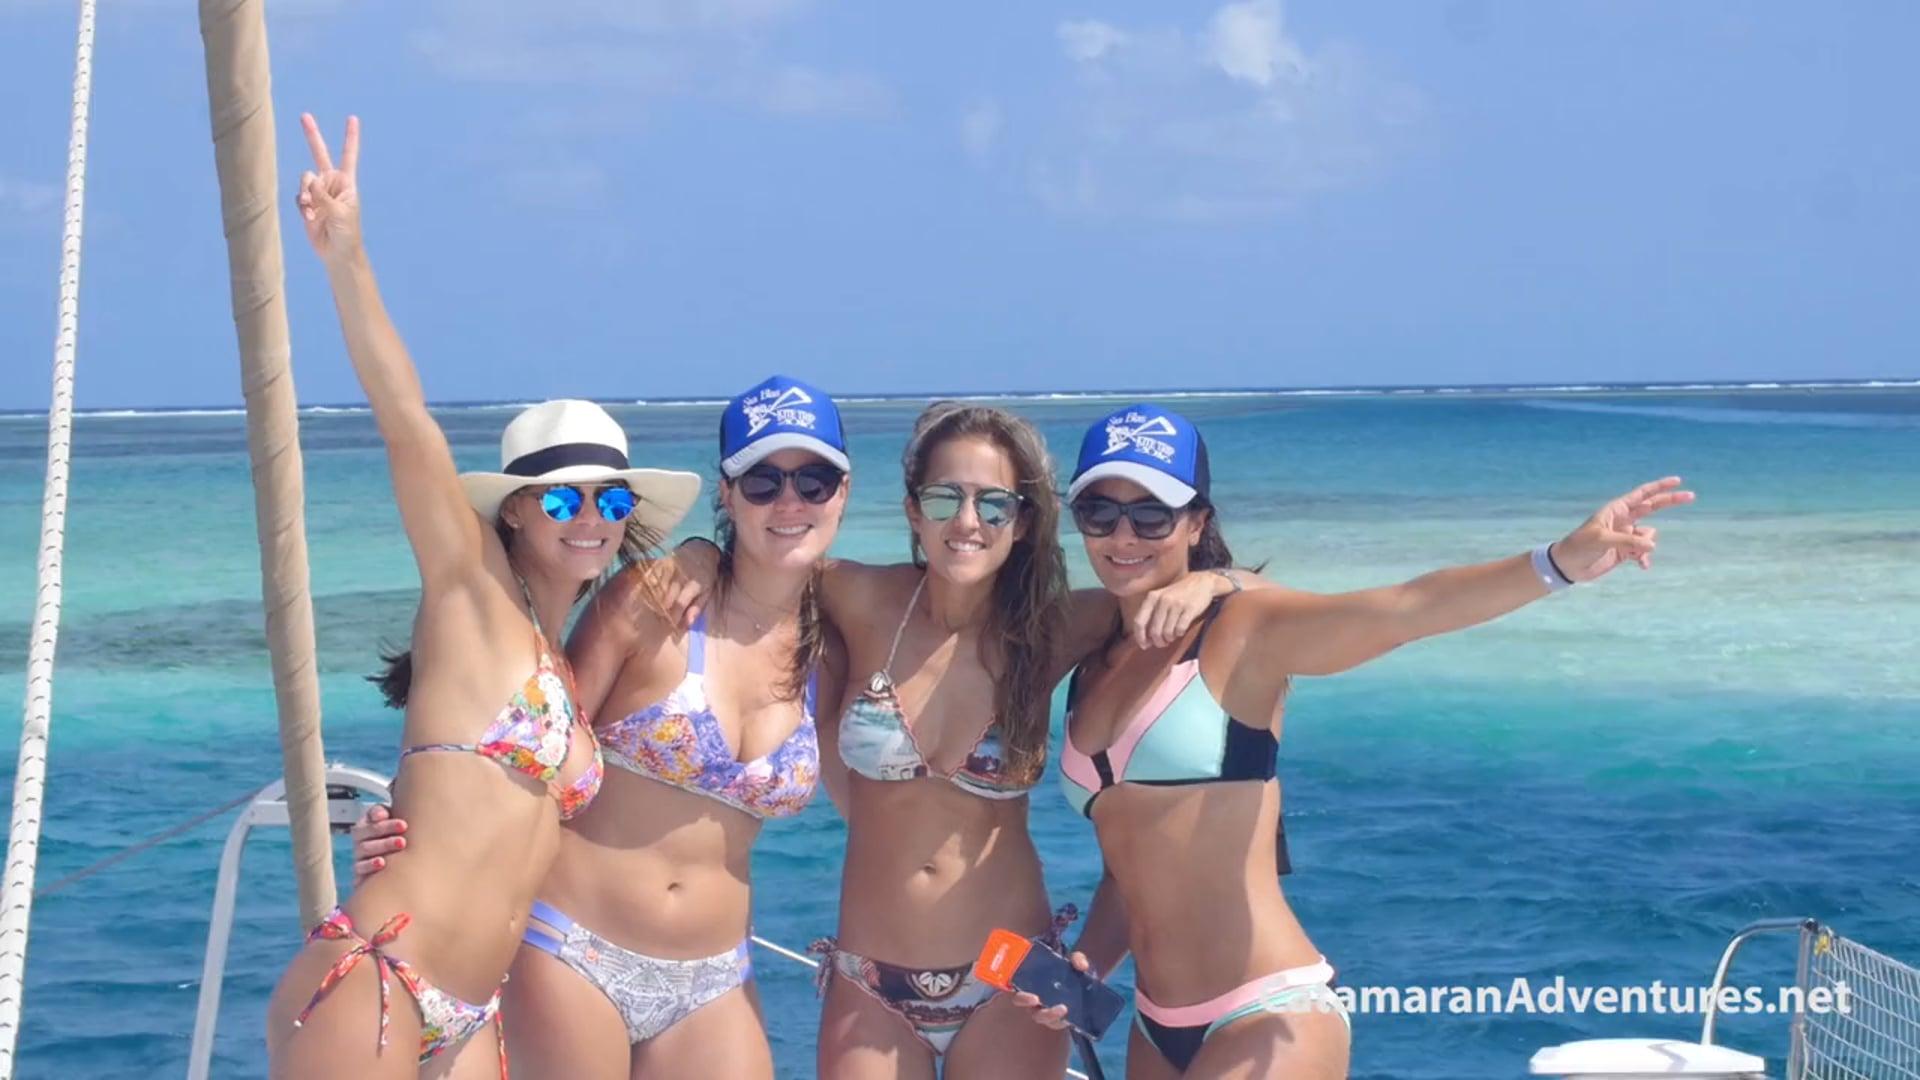 Catamaran for rent in Paradise, kitesurfing San Blas, the Caribbean side of Panama.